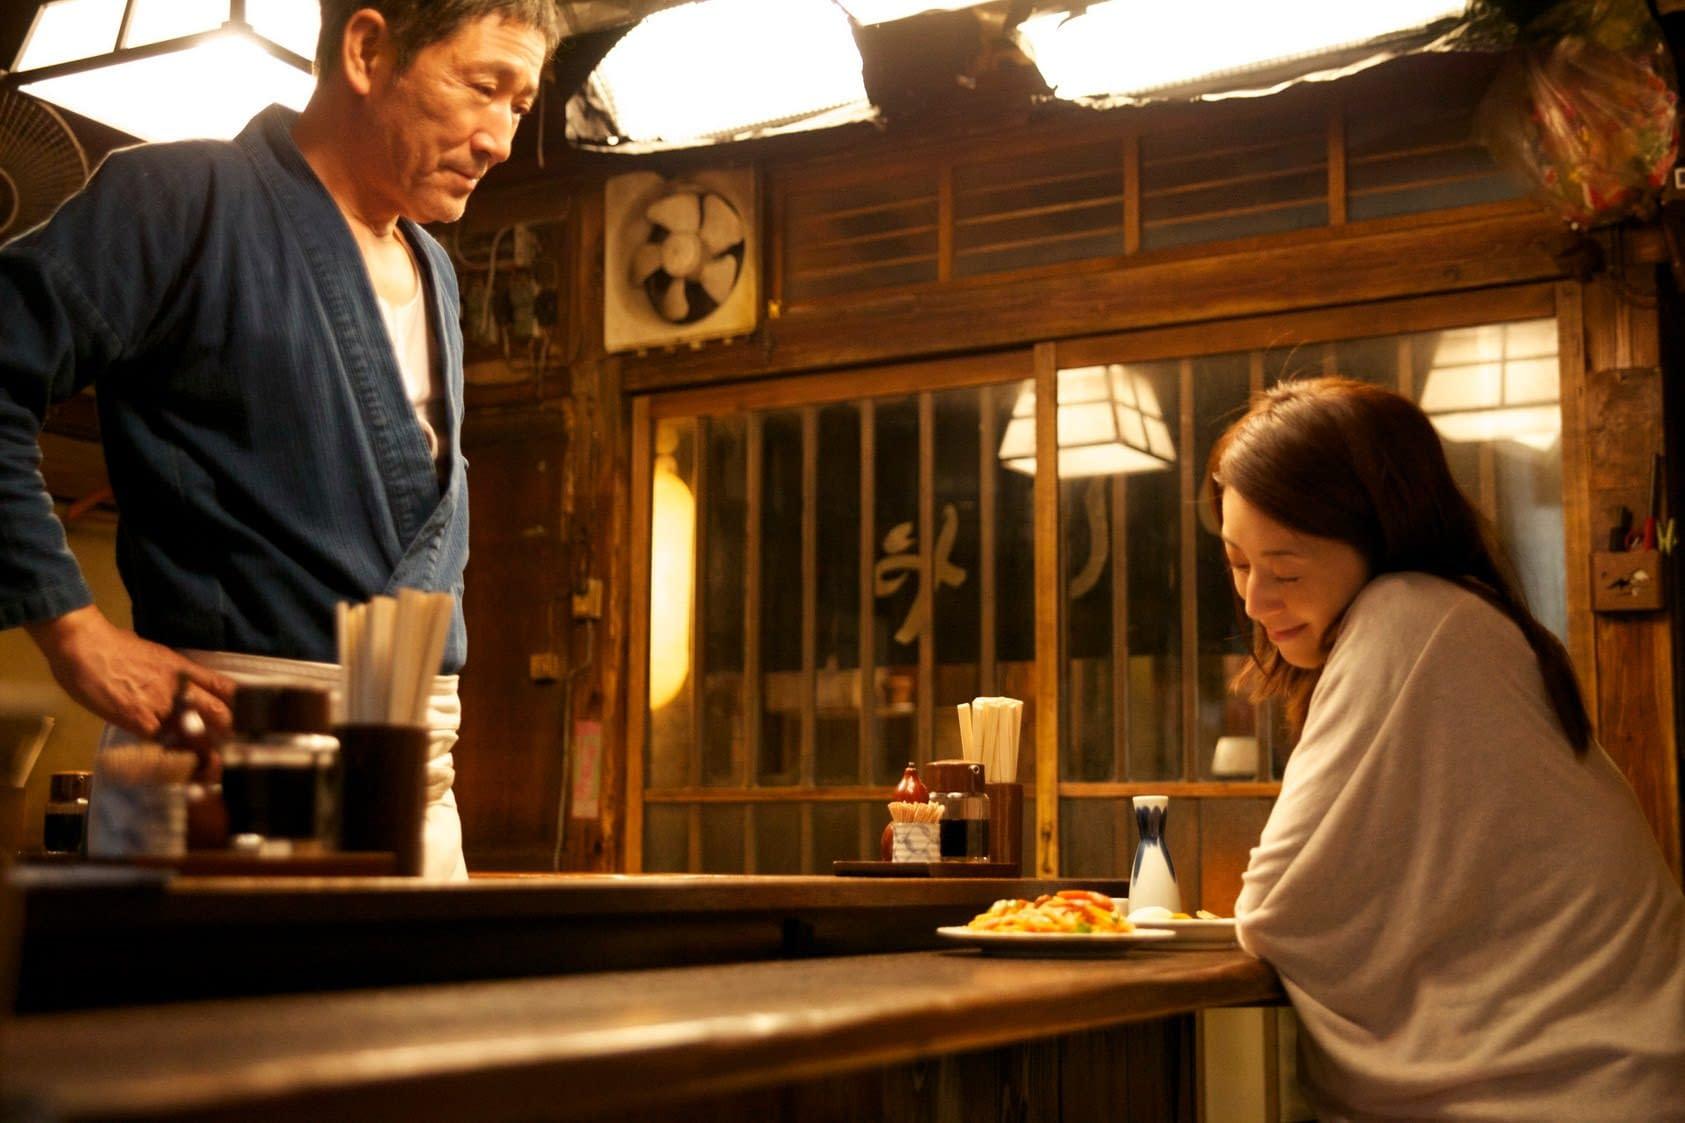 Midnight Diner Tokyo Stories Netflix Orders Up New Season